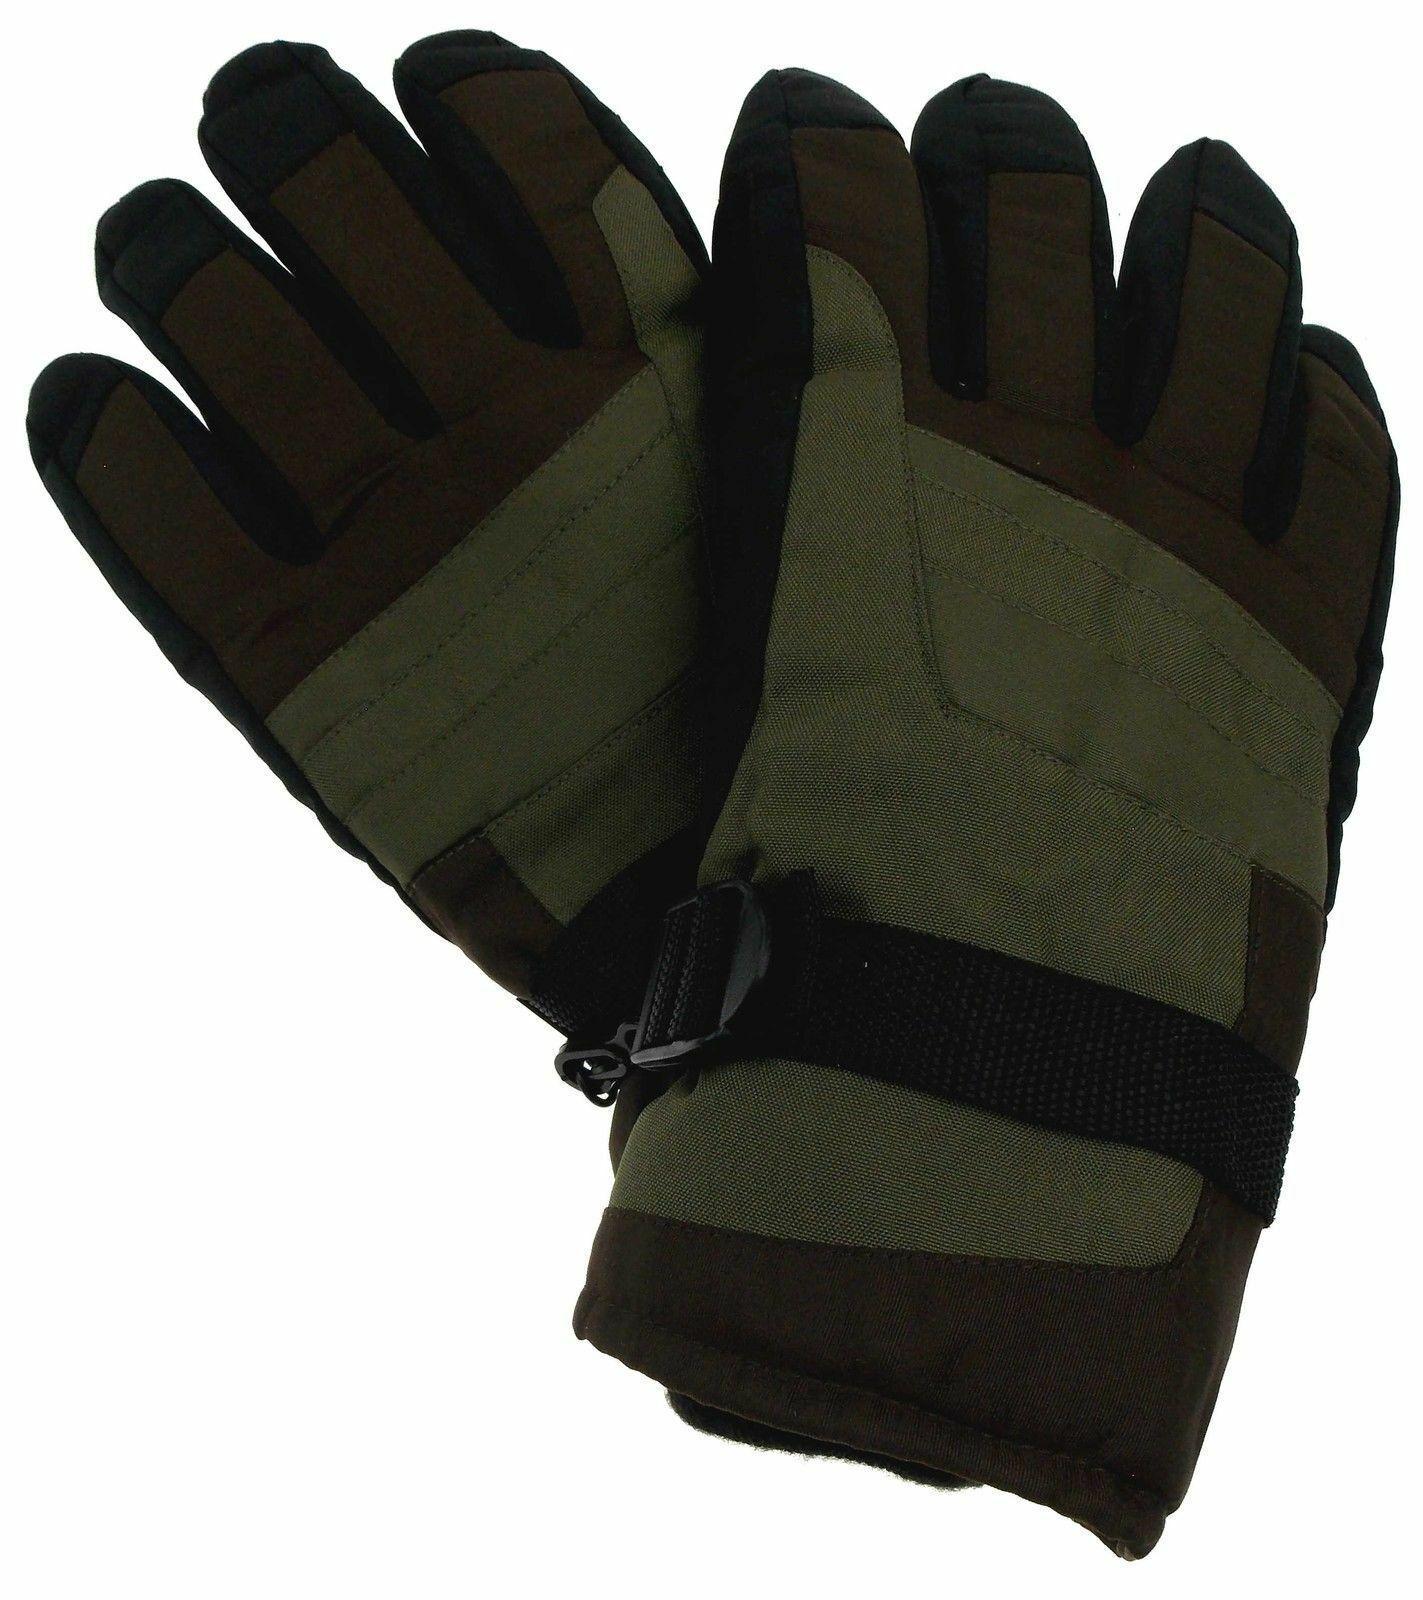 Athletech Mens Ski Gloves 3M Thinsulate Insulation Waterproof Warm Winter Snow